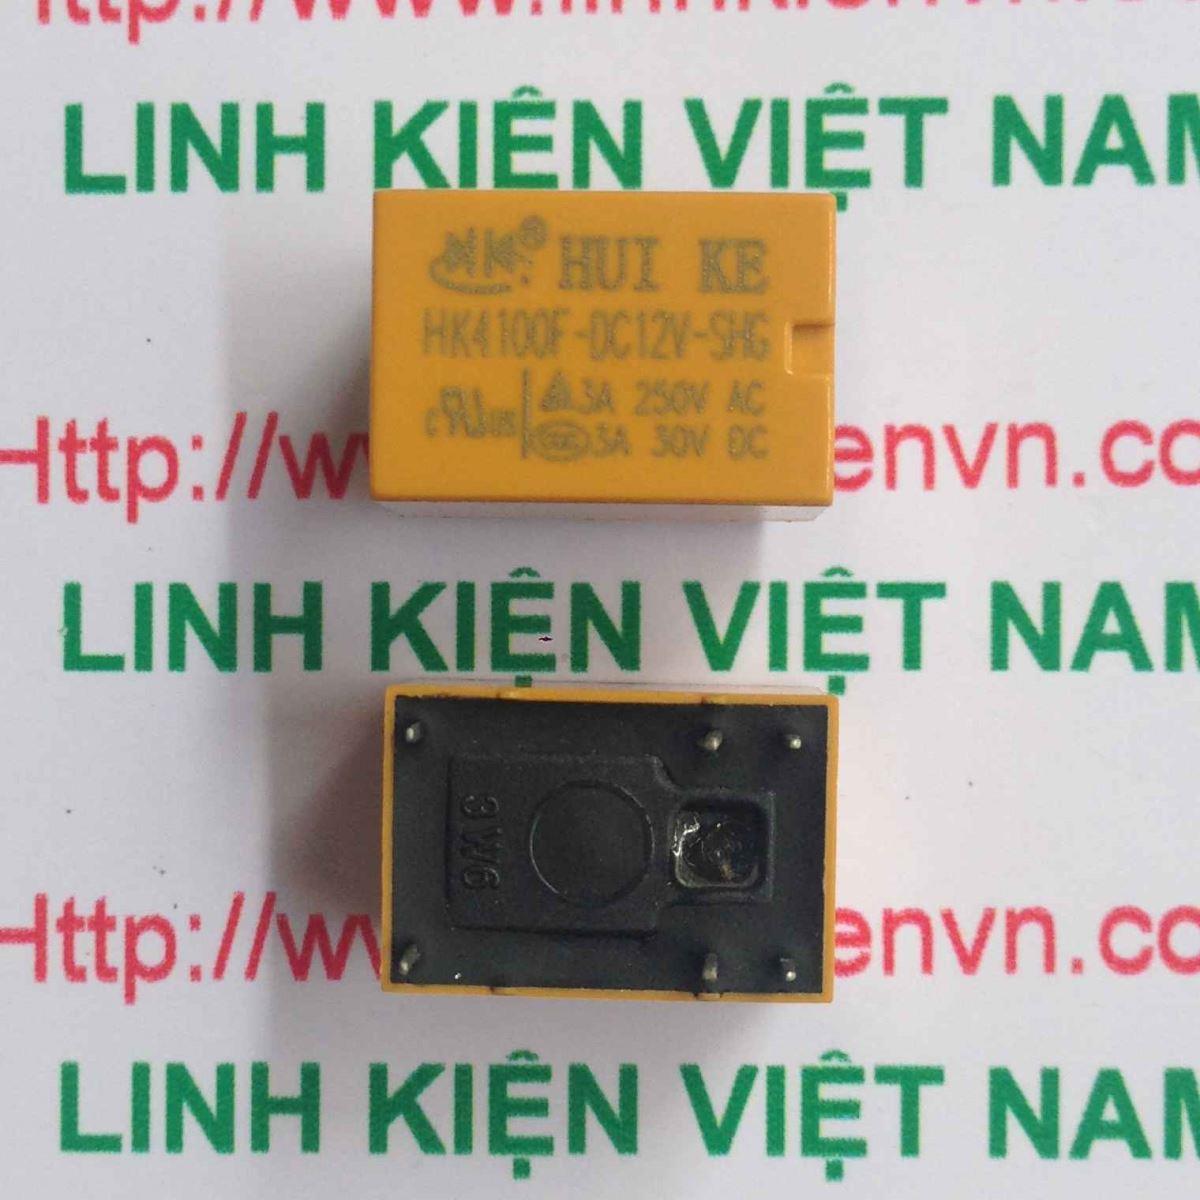 Relay Huike 1 cặp tiếp điểm 12V-3A | HK4100F-DC 12V-SHG - A1H6(KB4H3)